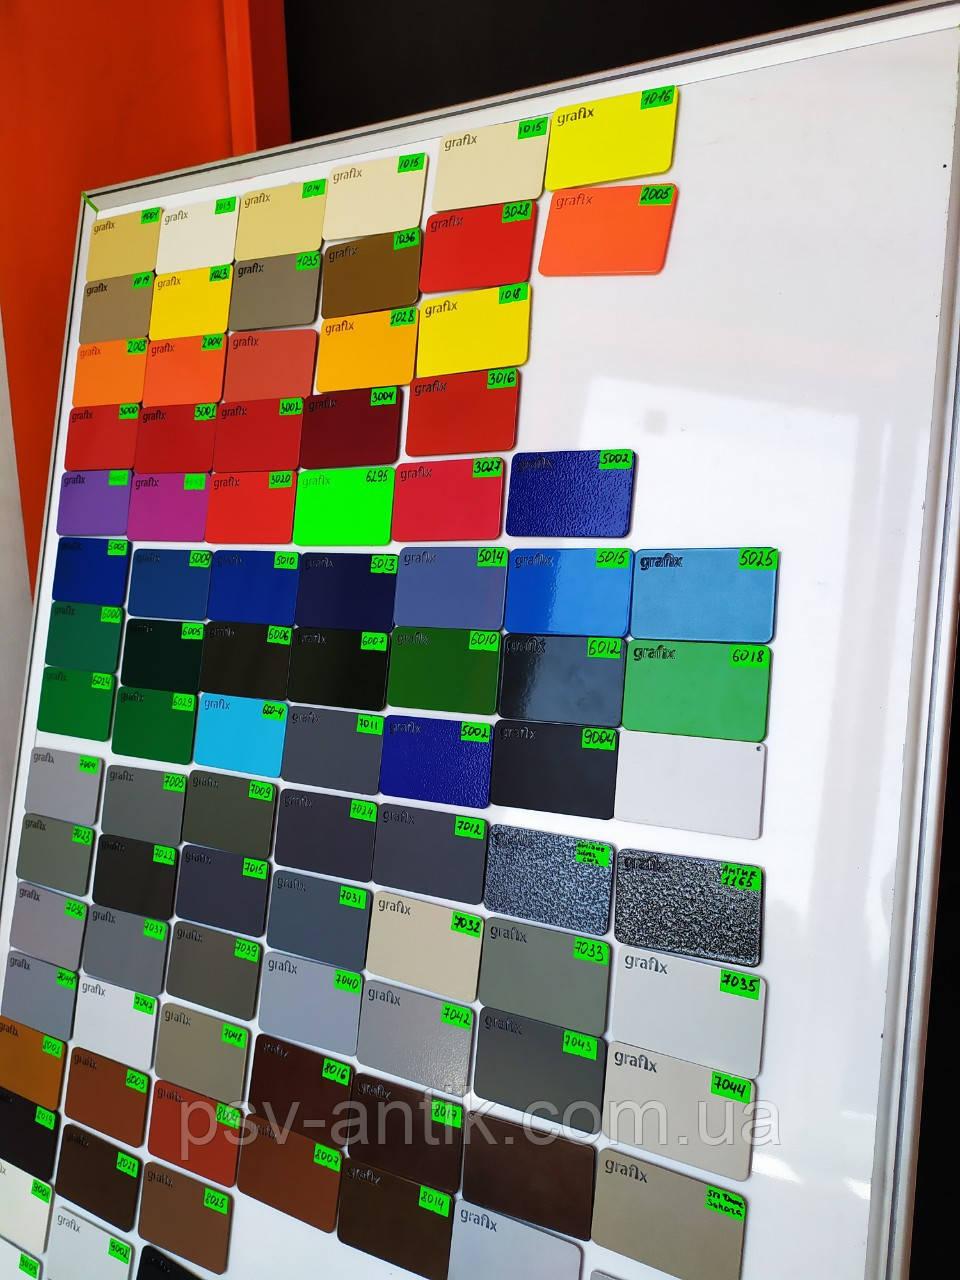 Порошковая краска глянцевая, полиэфирная, архитектурная, 5021